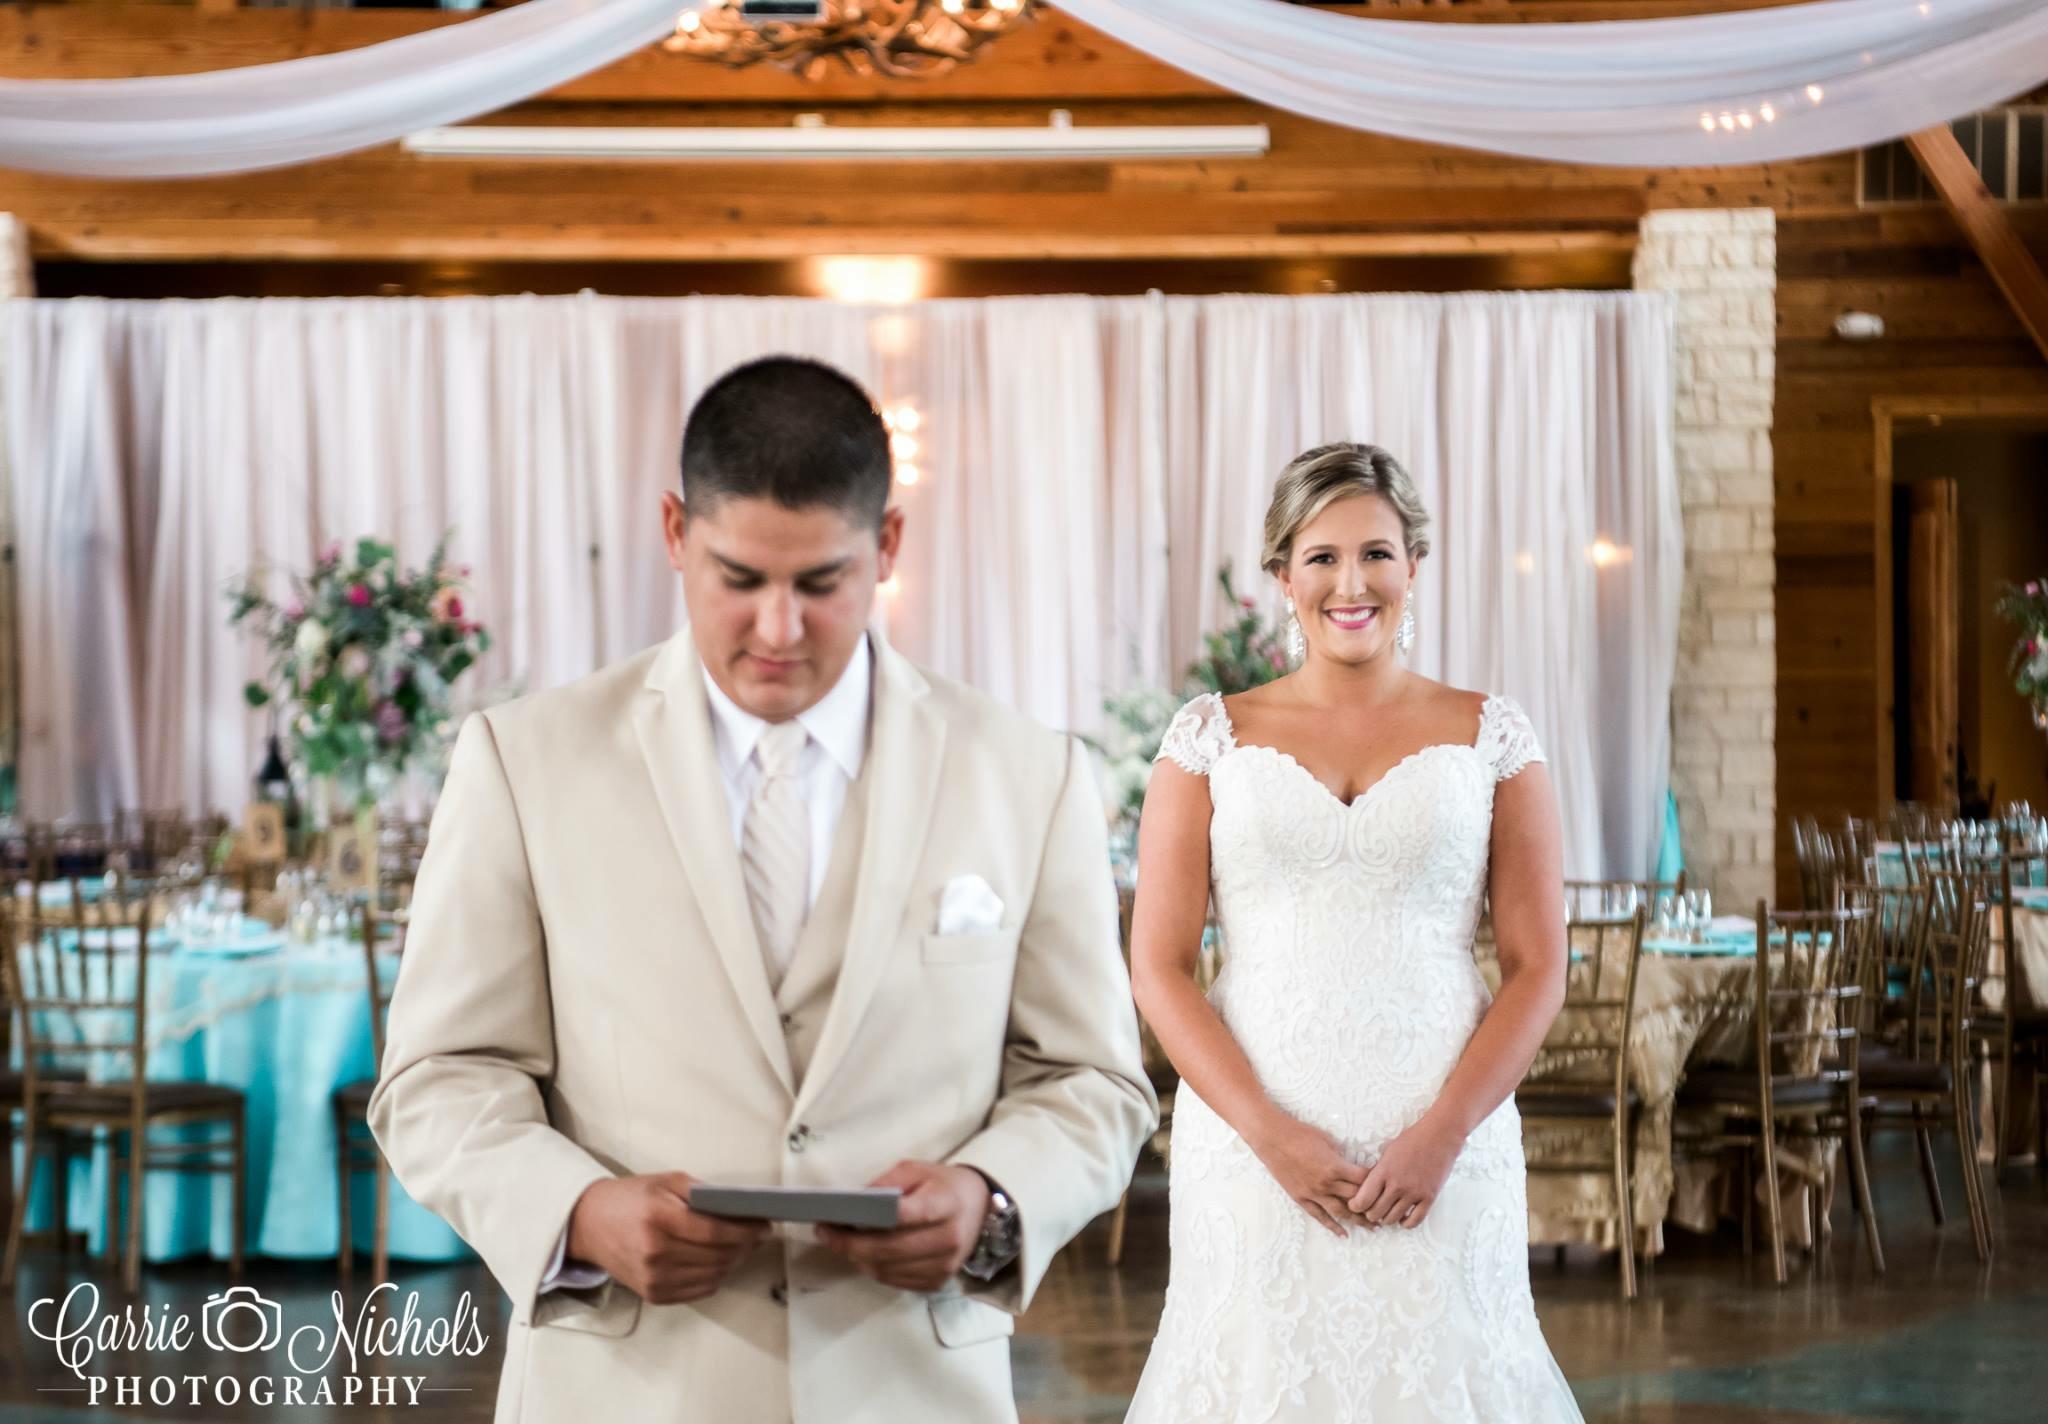 Rustic Wedding - First Look